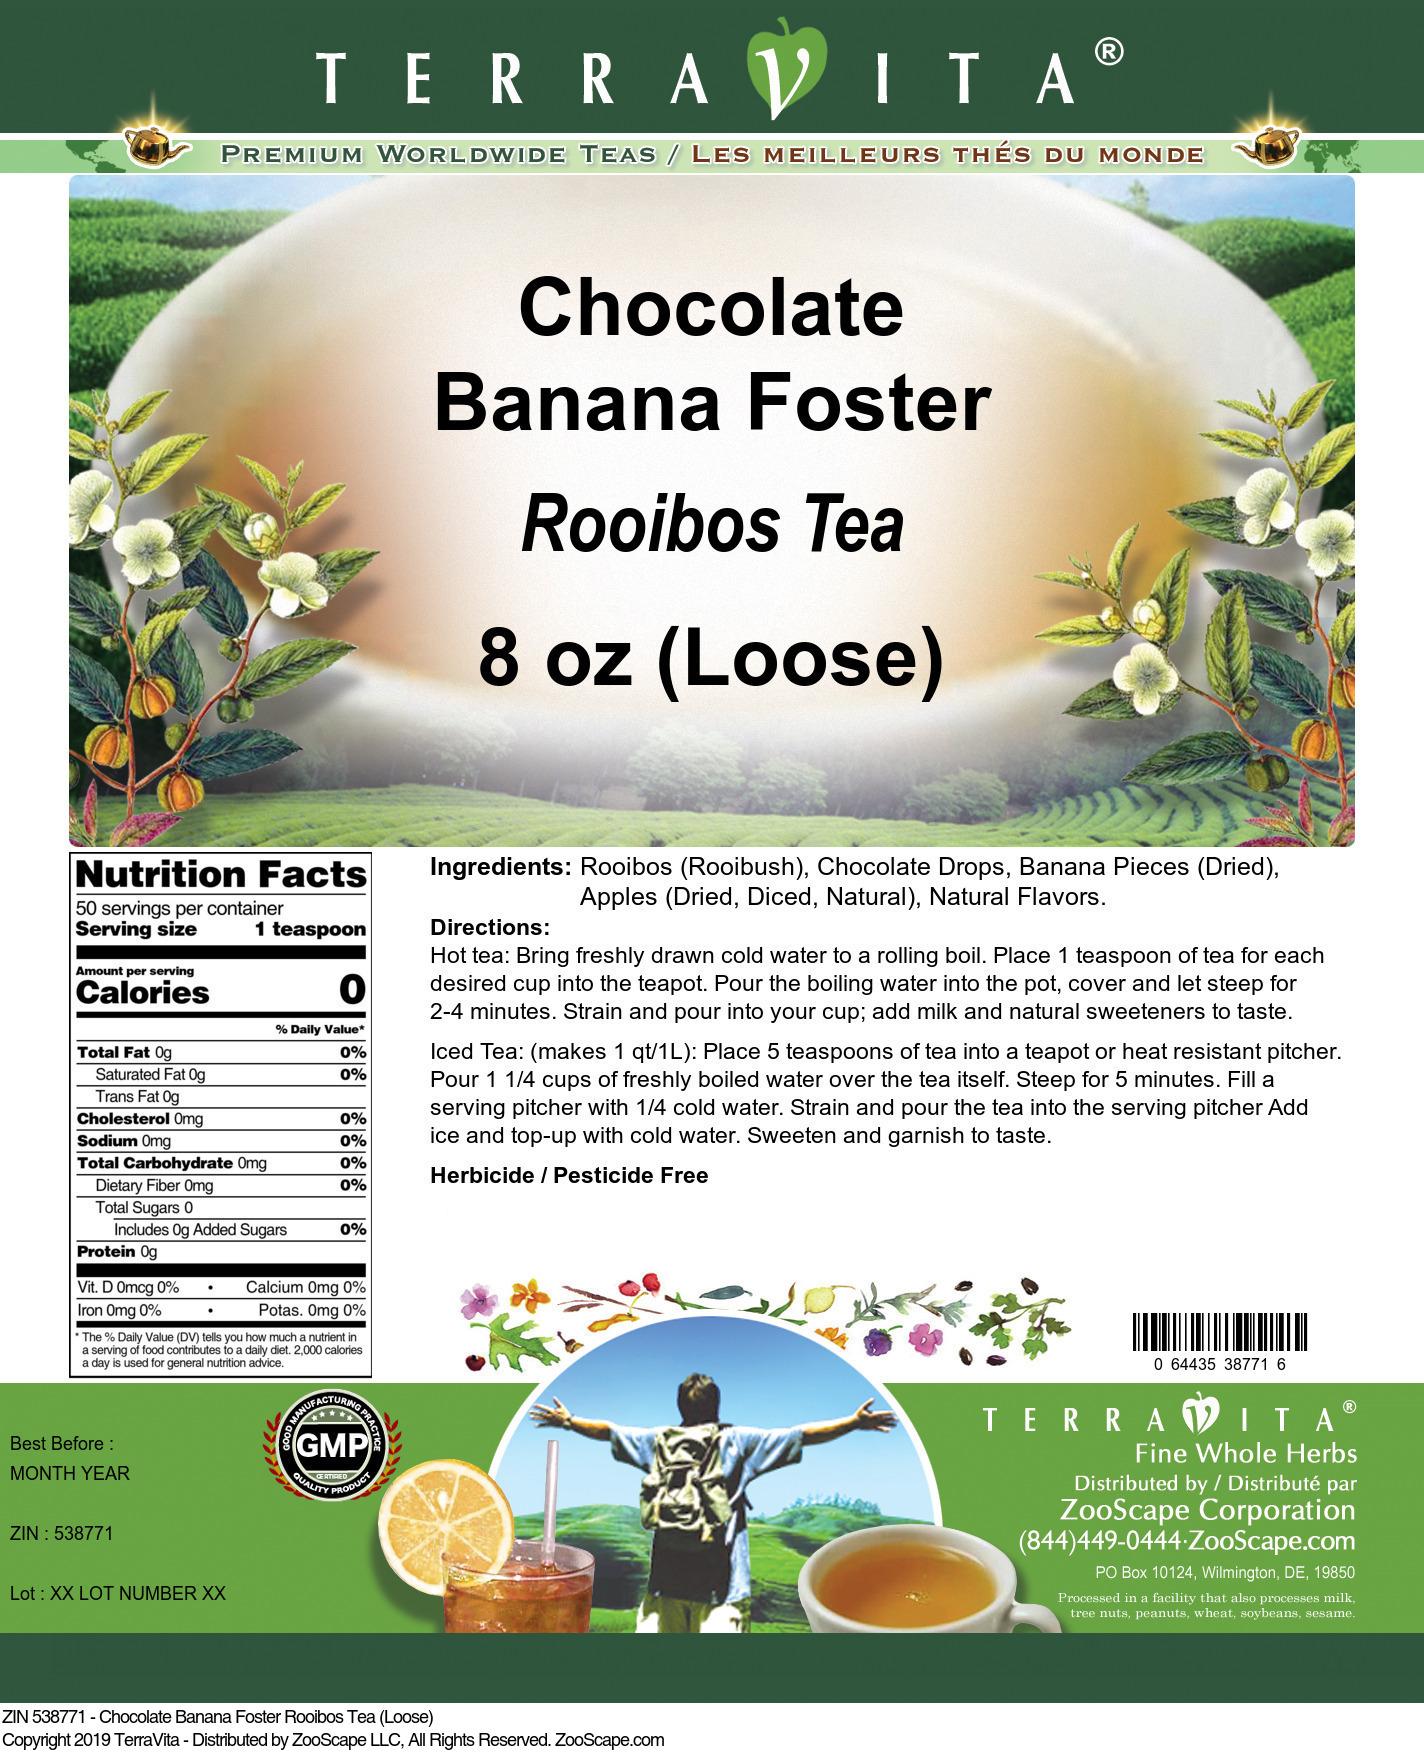 Chocolate Banana Foster Rooibos Tea